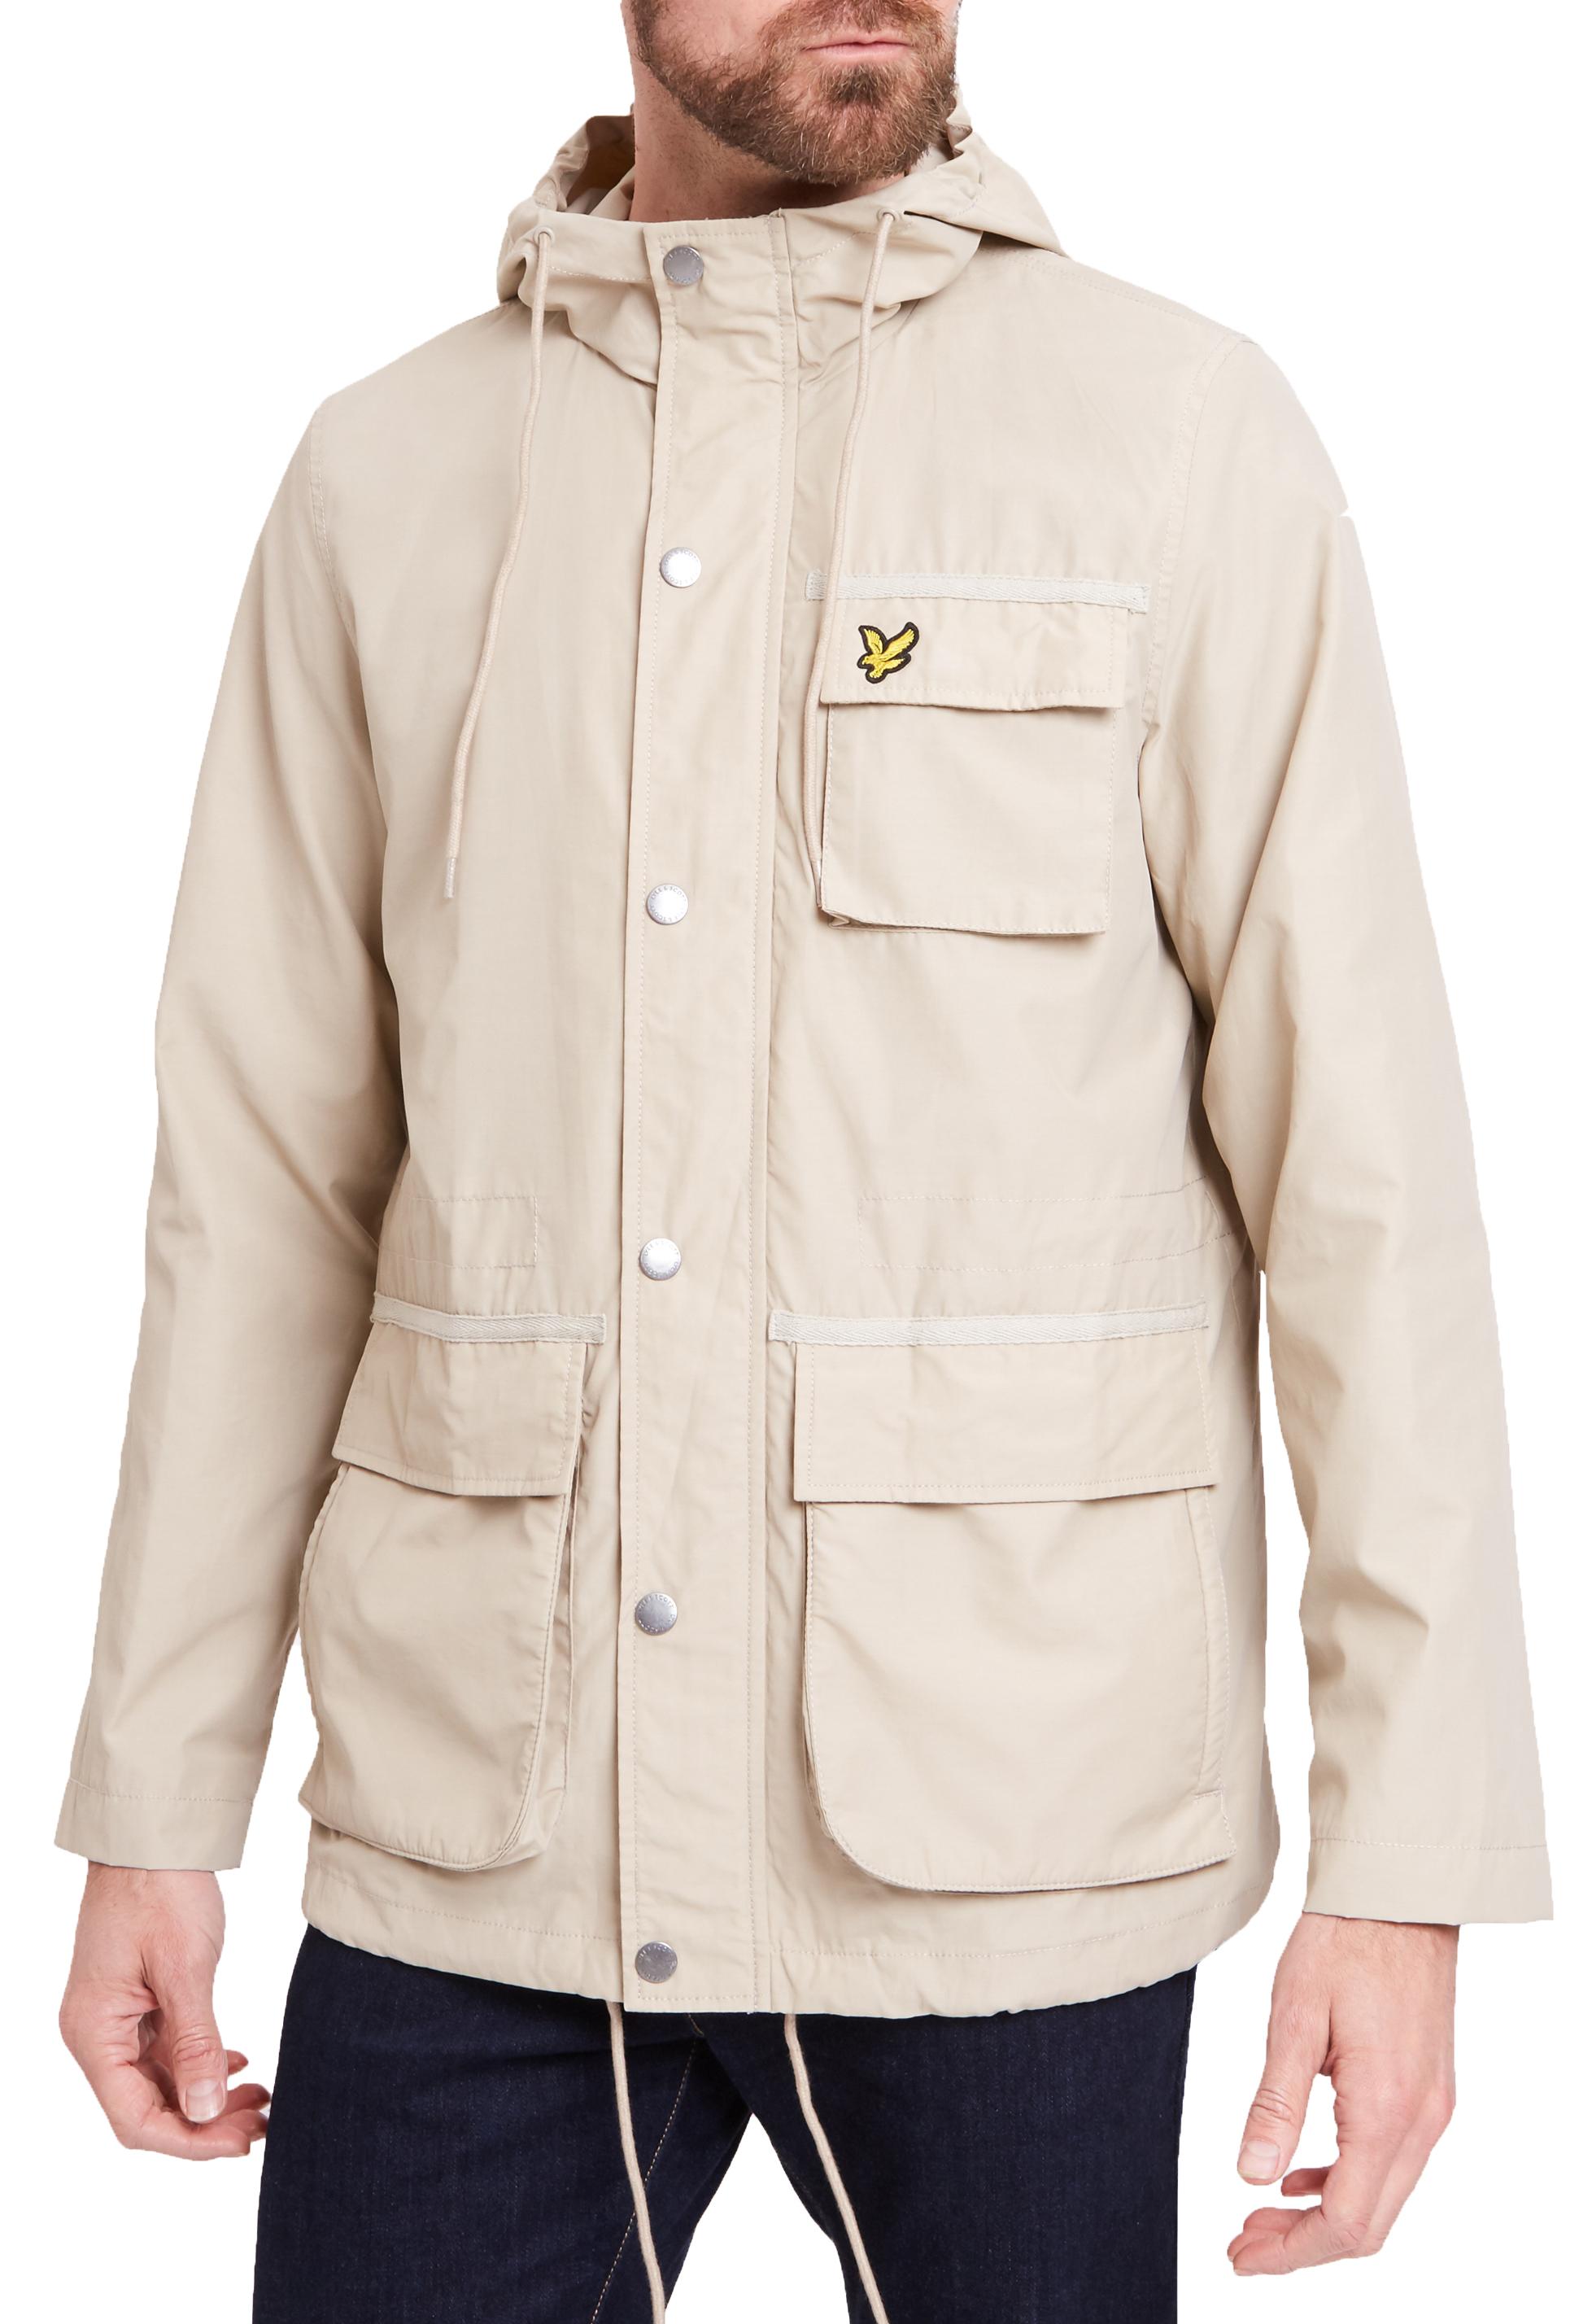 Lyle /& Scott Mens Pocket Jacket Lightweight Casual Hooded Coat Light Stone